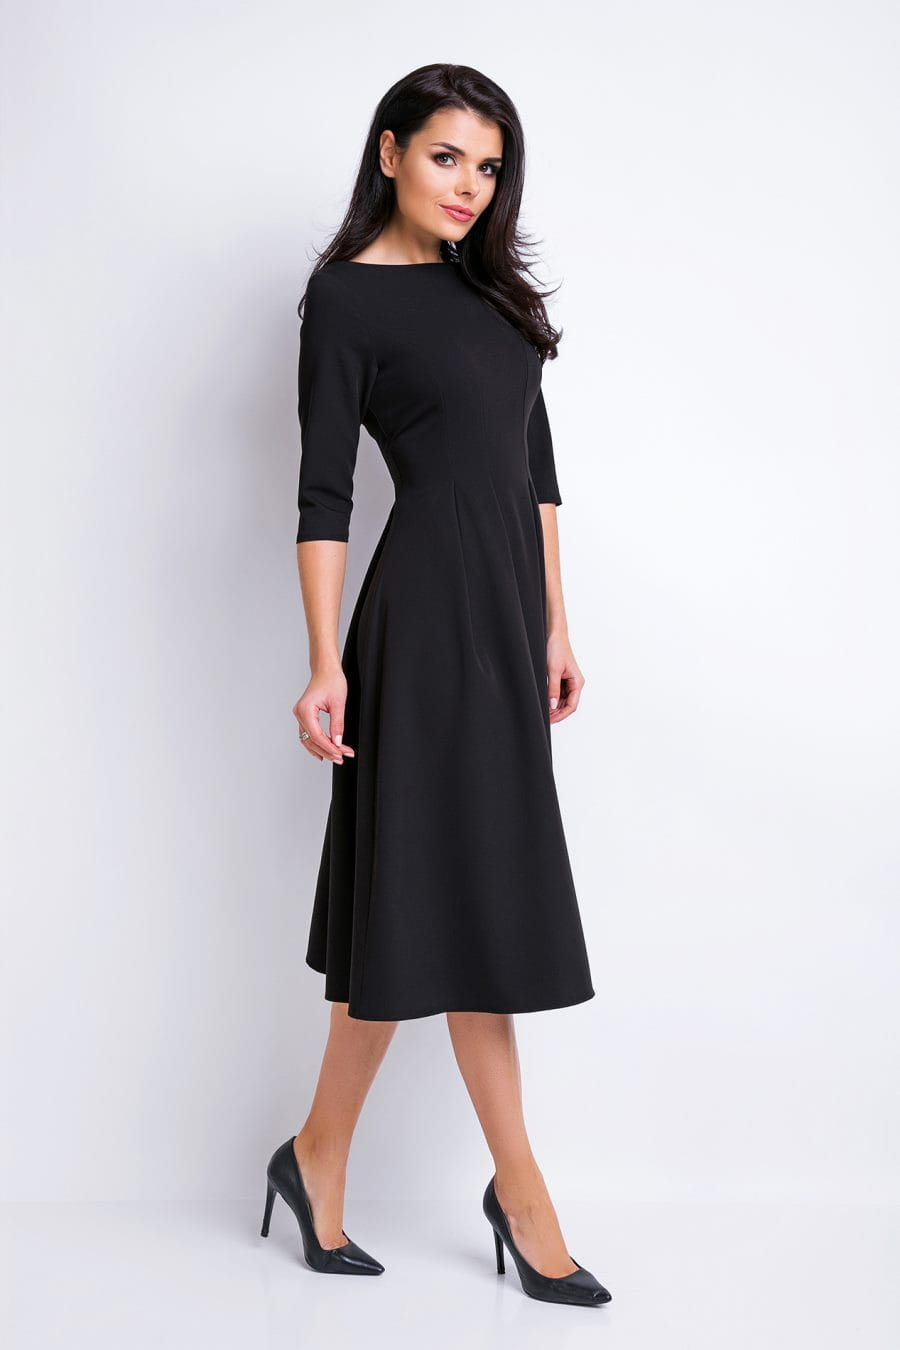 df57ce5941 Elegancka Sukienka Midi Czarna AW159 BESIMA.pl